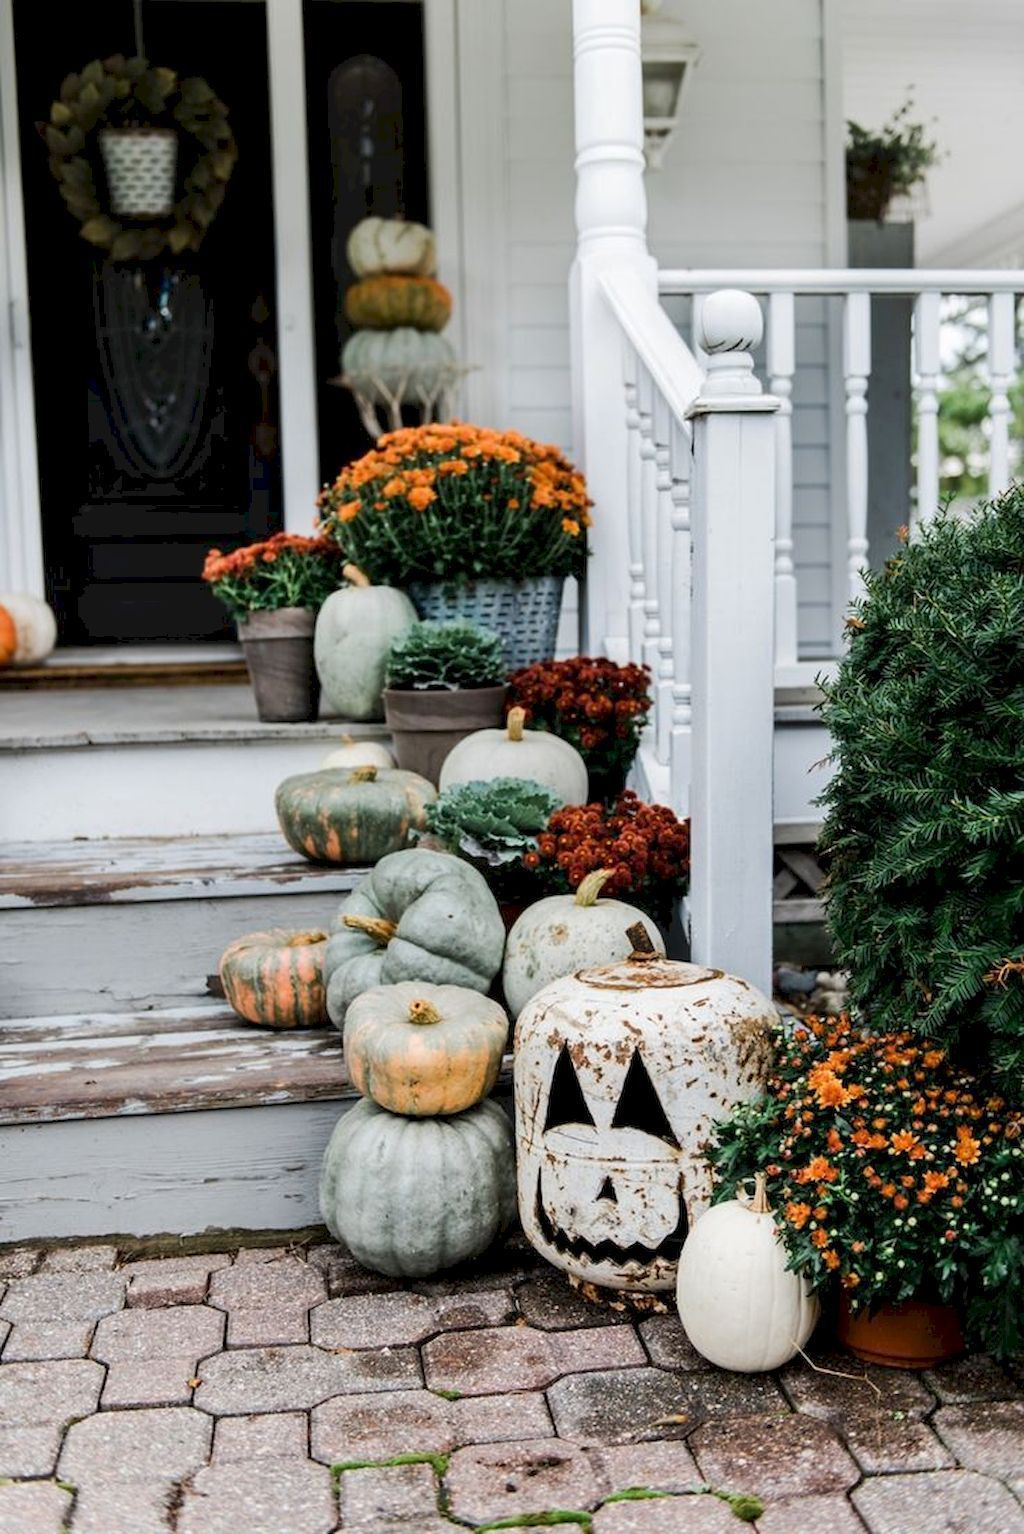 35-diy-fall-decor-ideas-for-small-porch-5b55f29d6d0e8 images